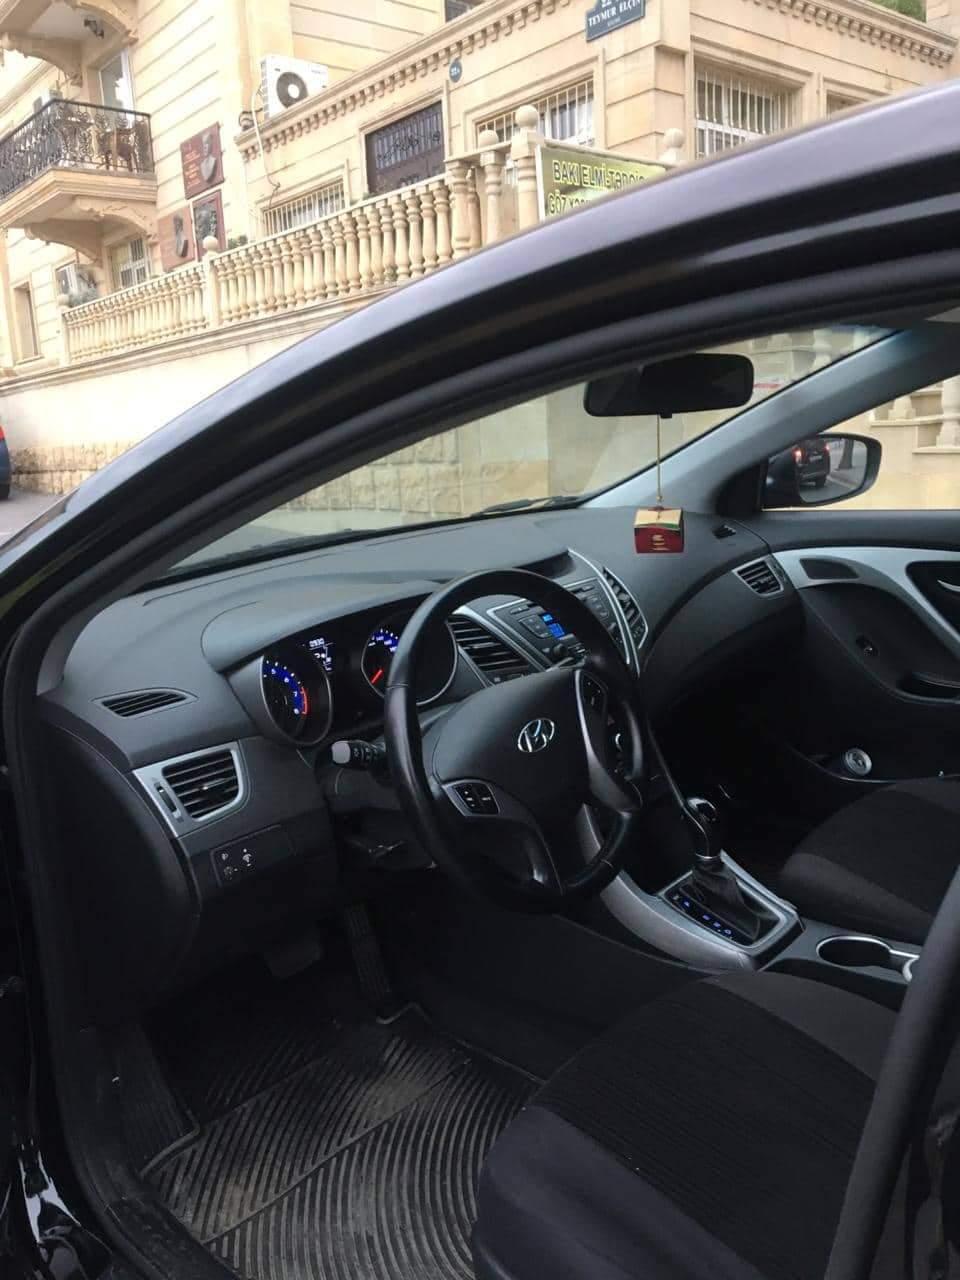 Hyundai Elantra 1.6(lt) 2015 İkinci əl  $24000